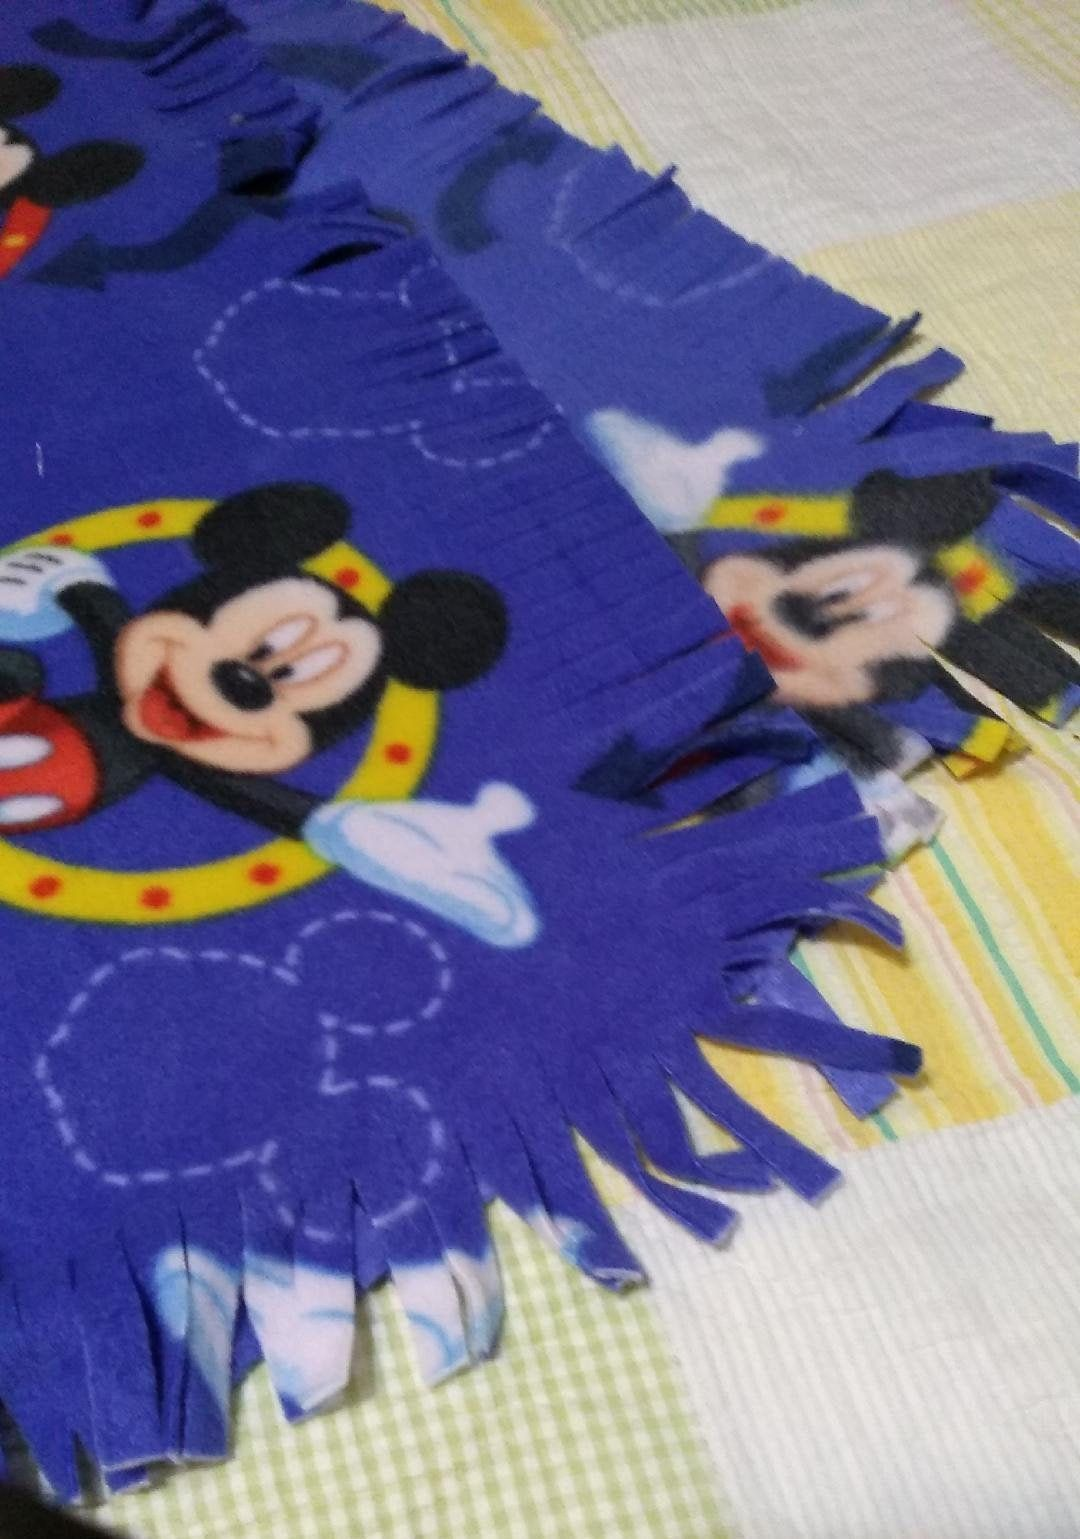 Micky Cuddle Fleece Blanket with crochet edge